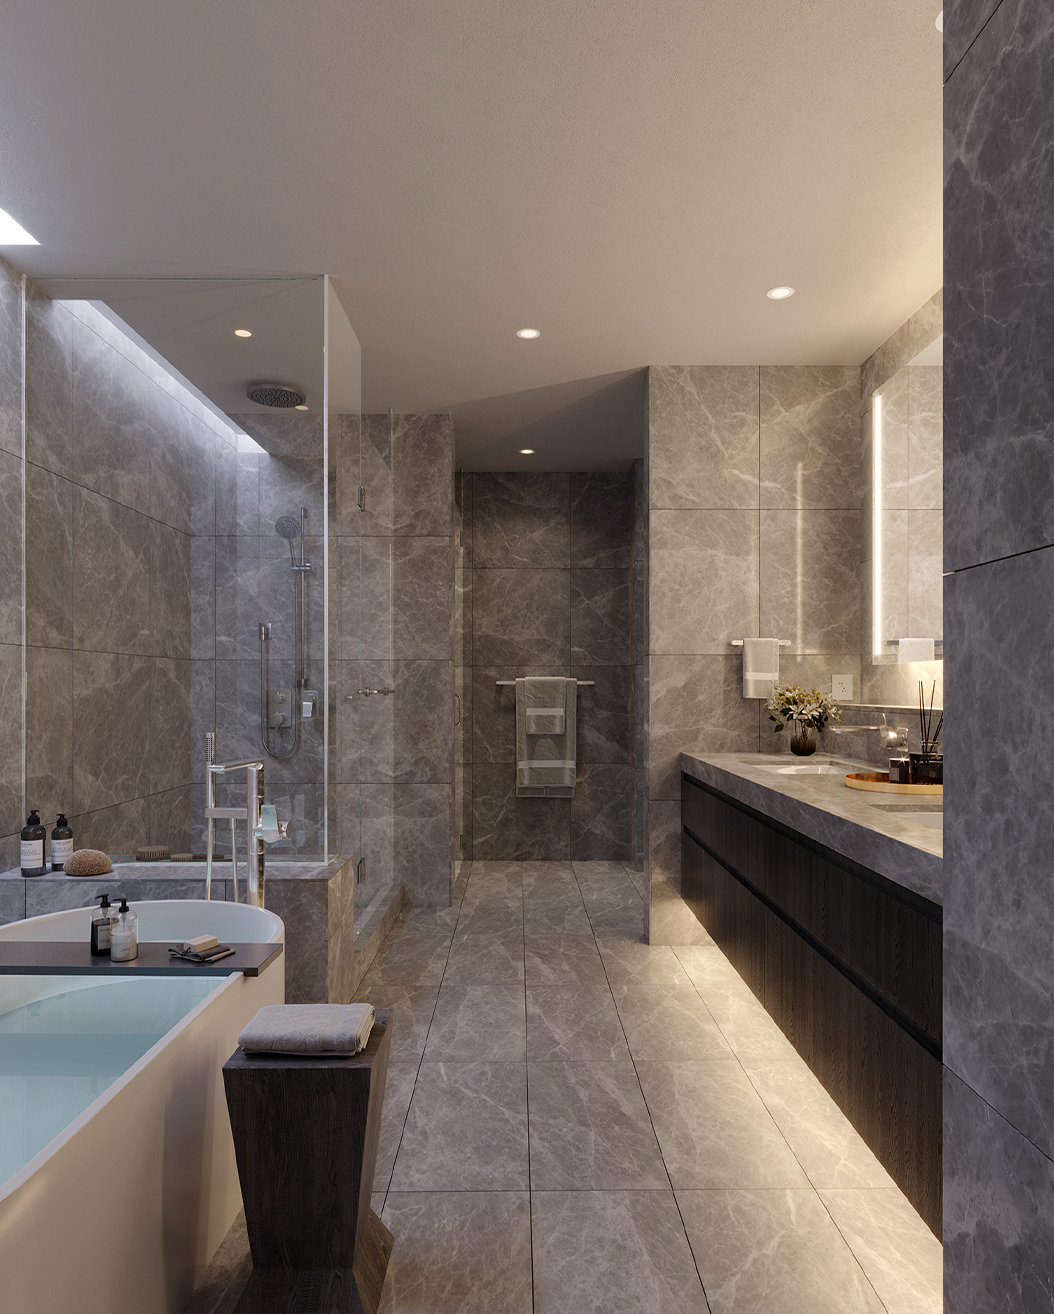 Tesoro - 1551 Quebec St - Bath Room!